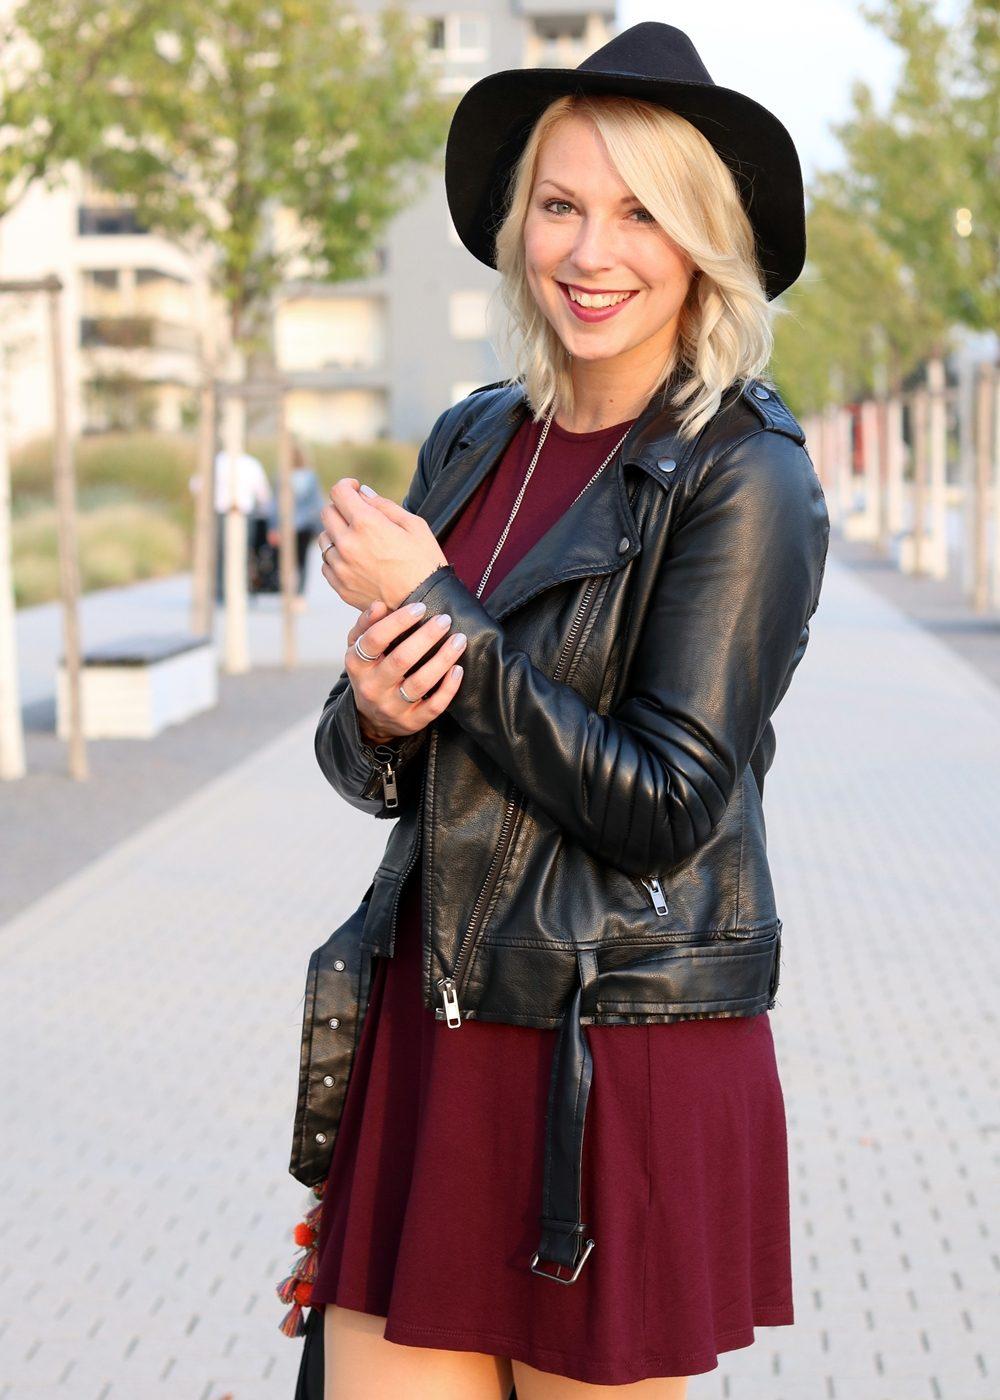 fashionblogger-outfit-karlsruhe-kleid-bordeaux-schwarze-overknees-hut-lederjacke-fransentasche-7